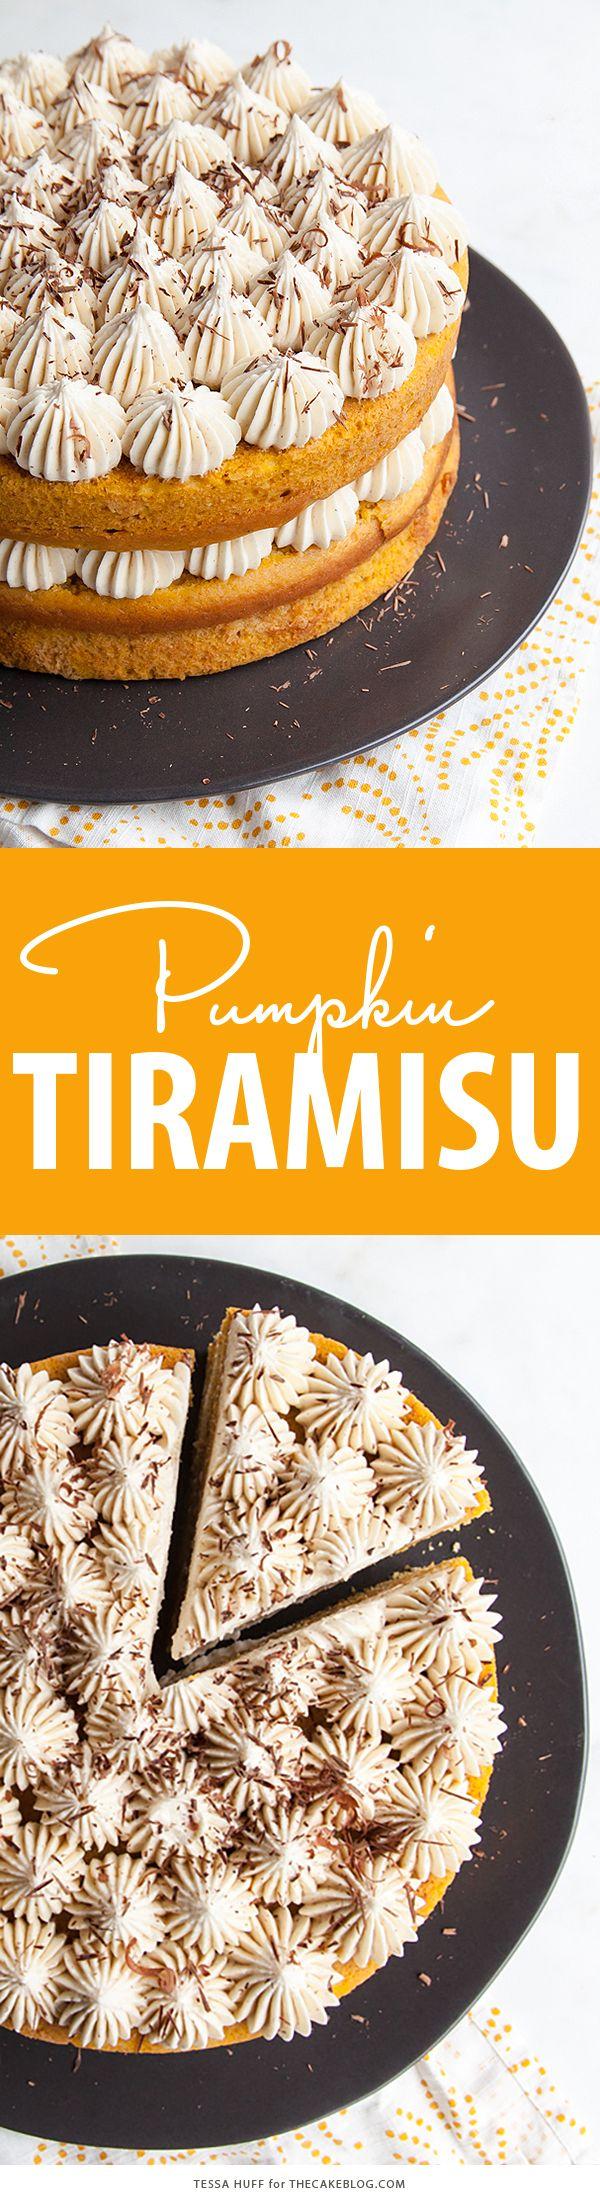 Pumpkin Tiramisu Cake for Thanksgiving dessert. Pumpkin cake soaked with coffee liqueur, layered with mascarpone frosting and chocolate shavings | Tessa Huff for TheCakeBlog.com